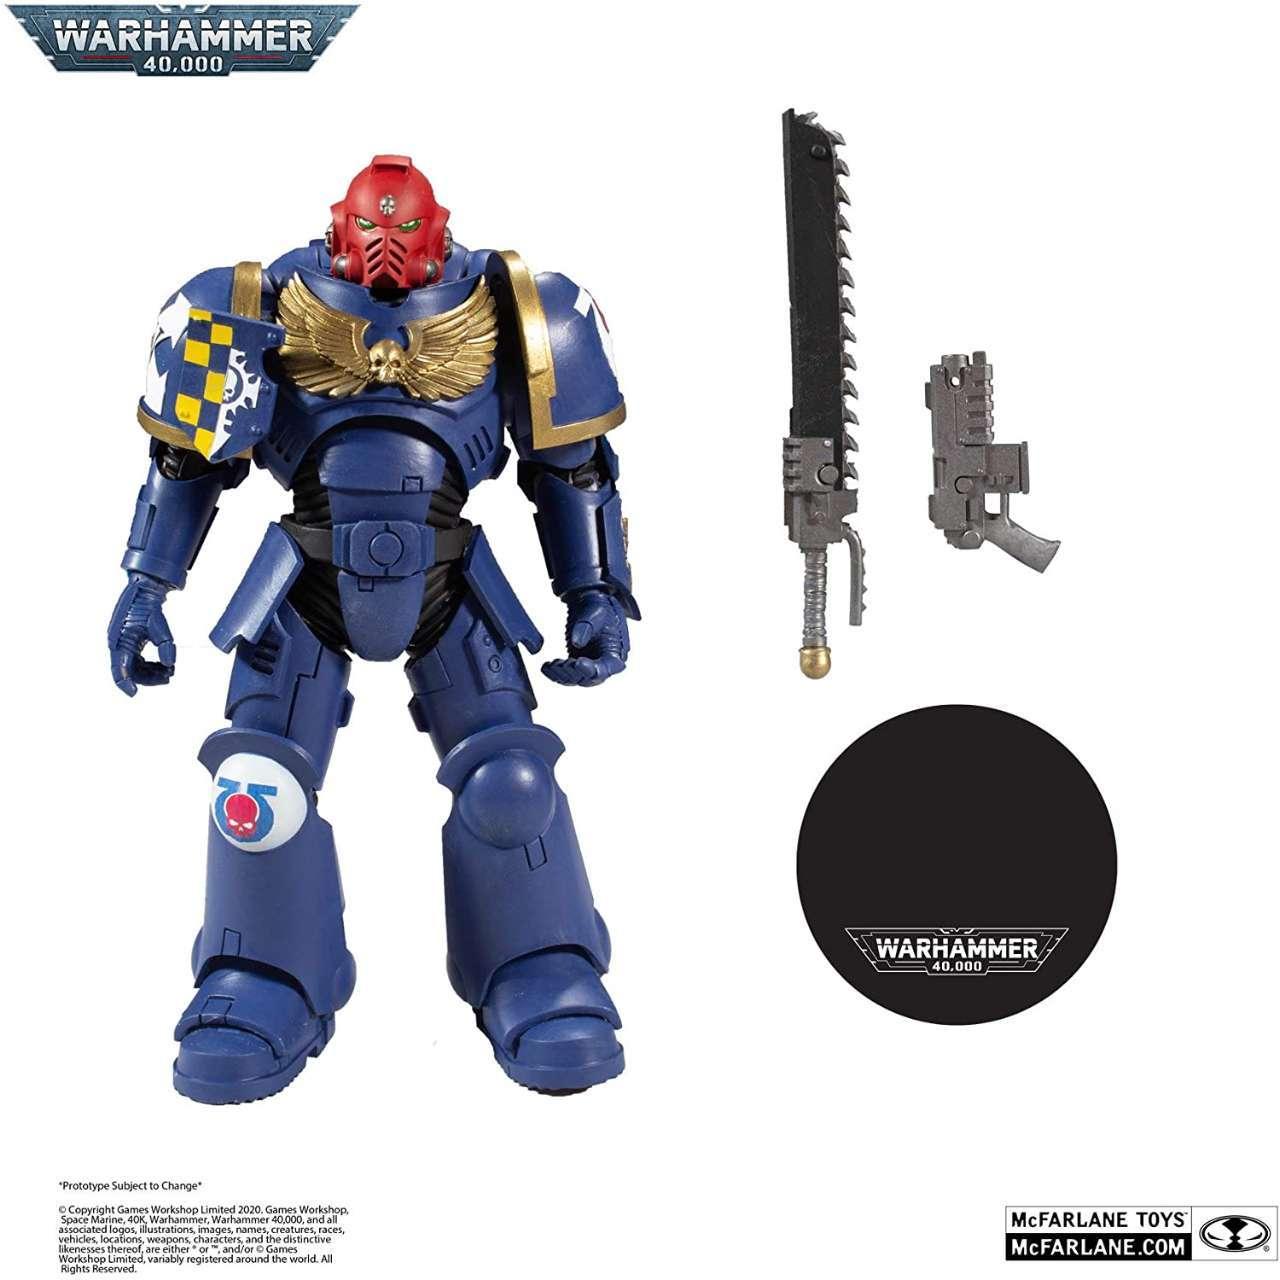 mcfarlane-warhammer-4000071JKlasWrGL_AC_SL1500_